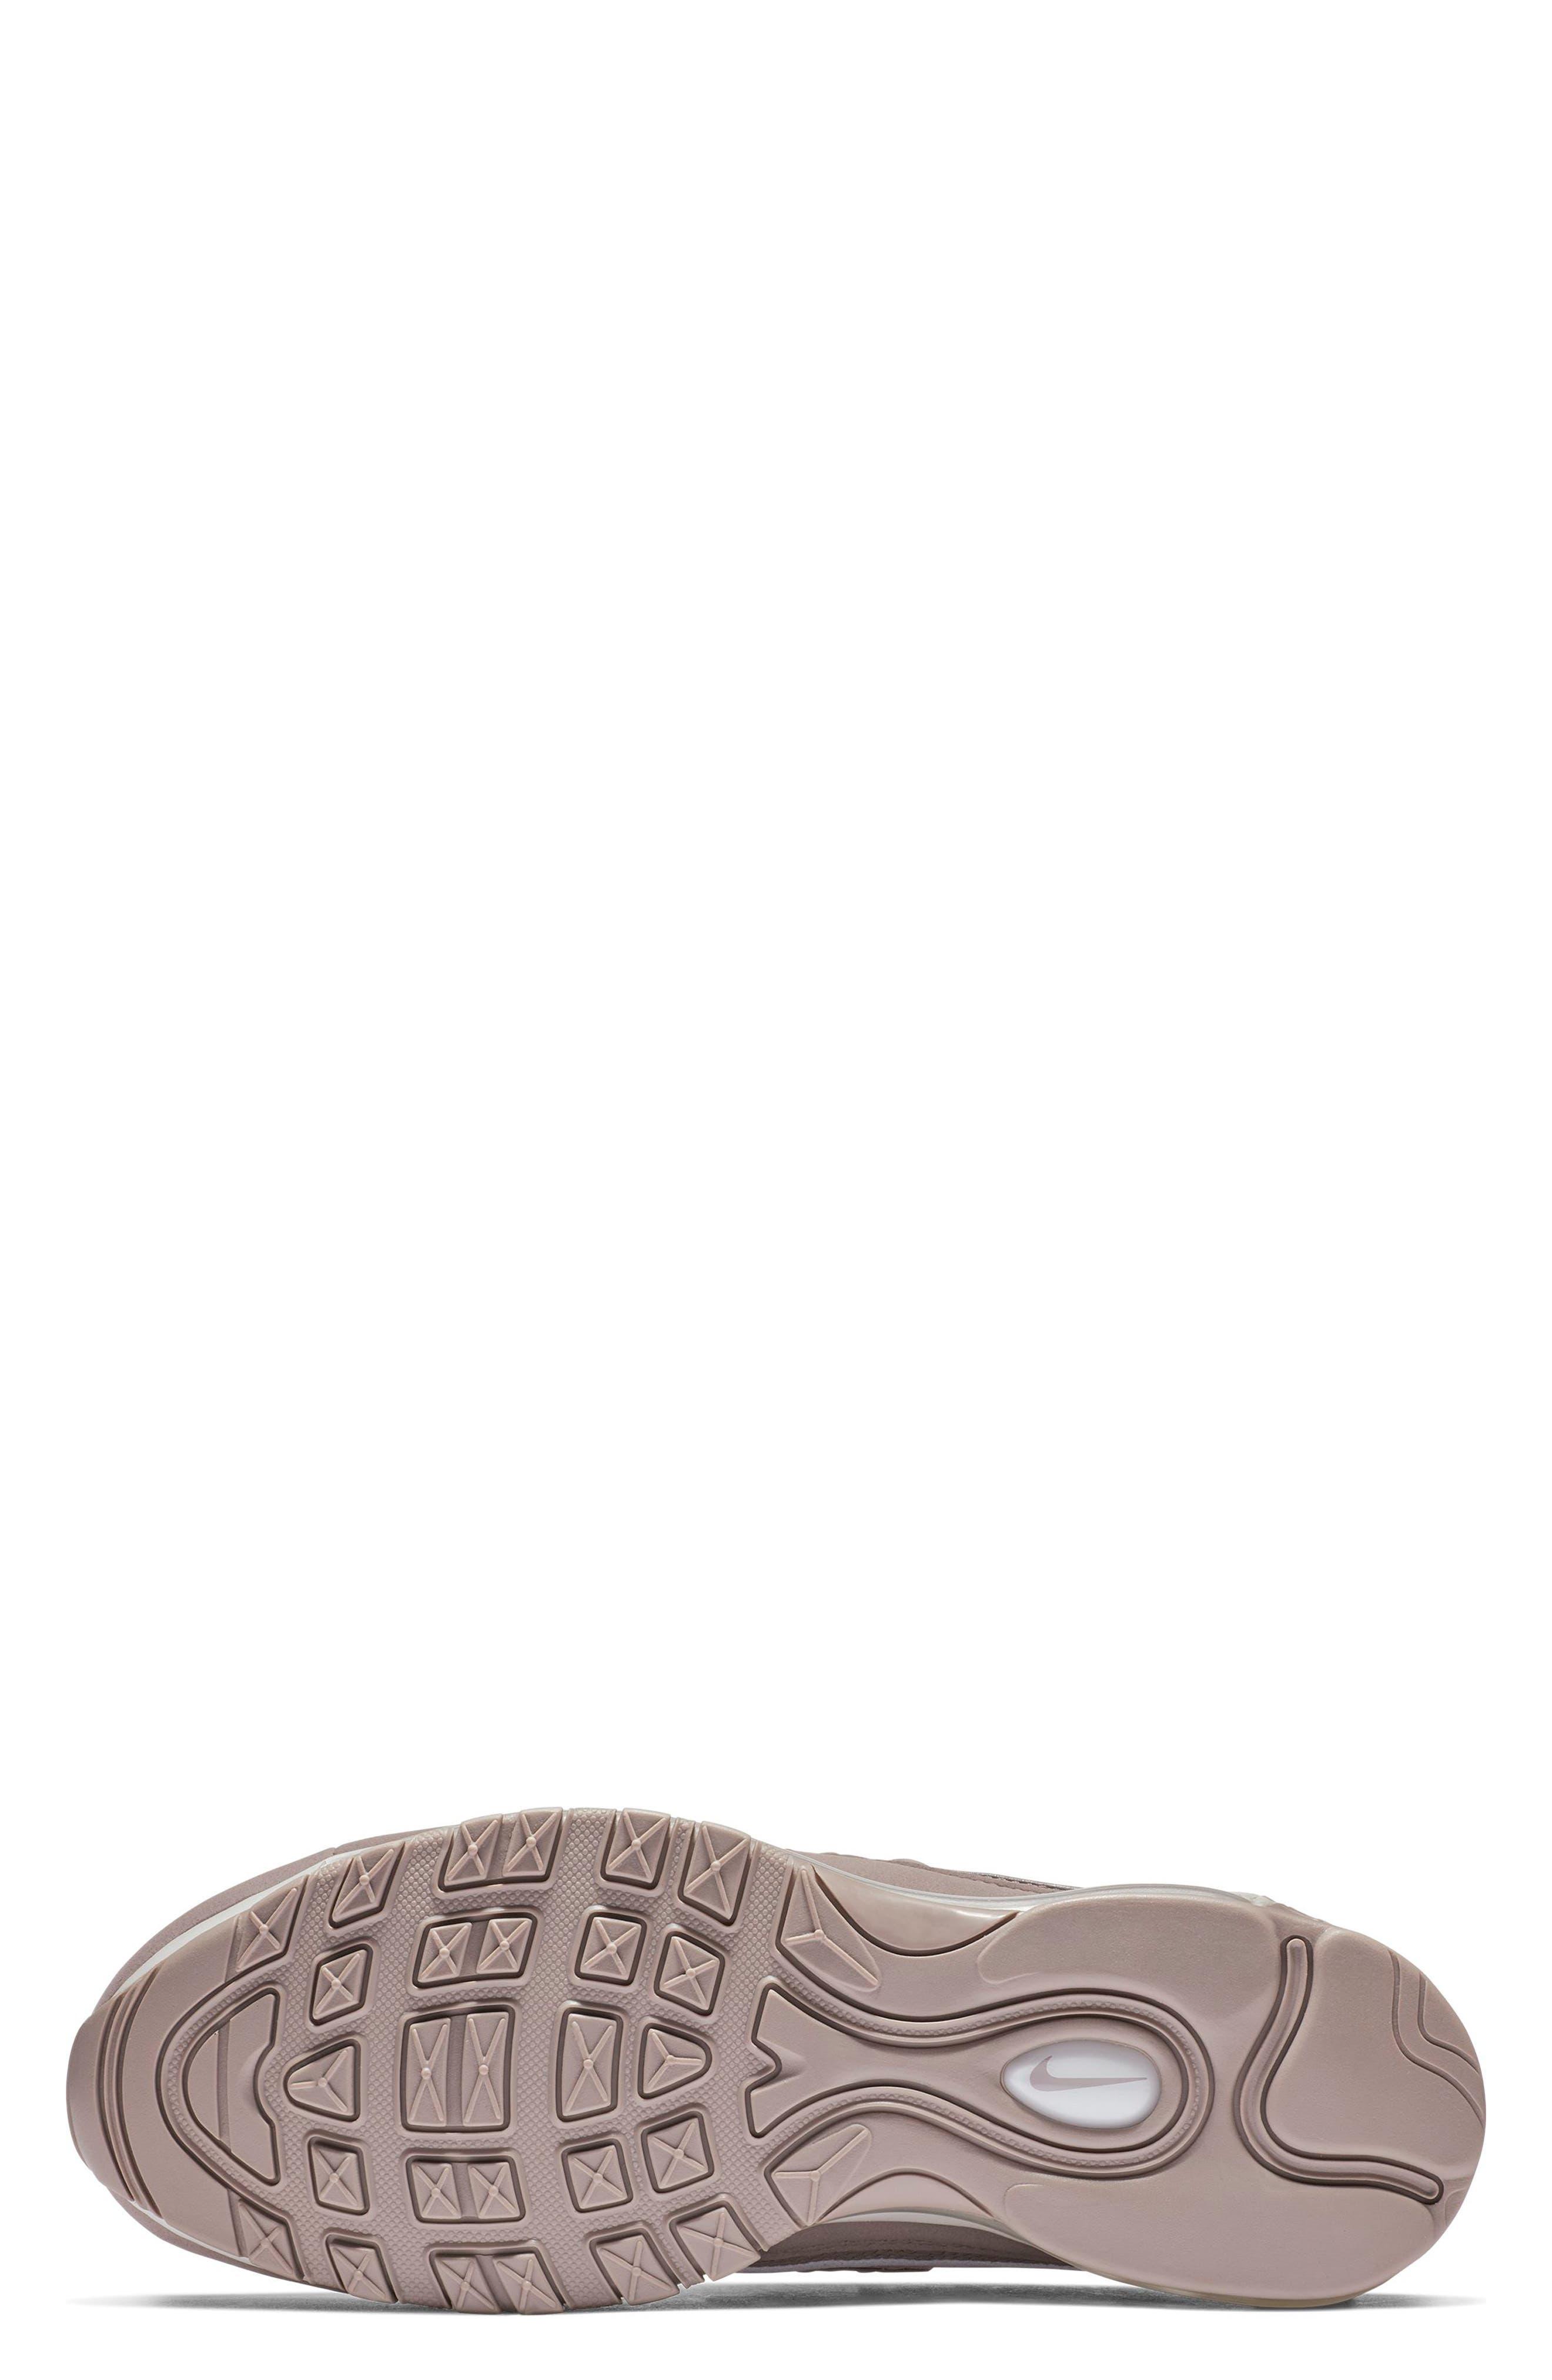 Air Max 98 Sneaker,                             Alternate thumbnail 5, color,                             PUMICE/ PLUM CHALK/ WHITE